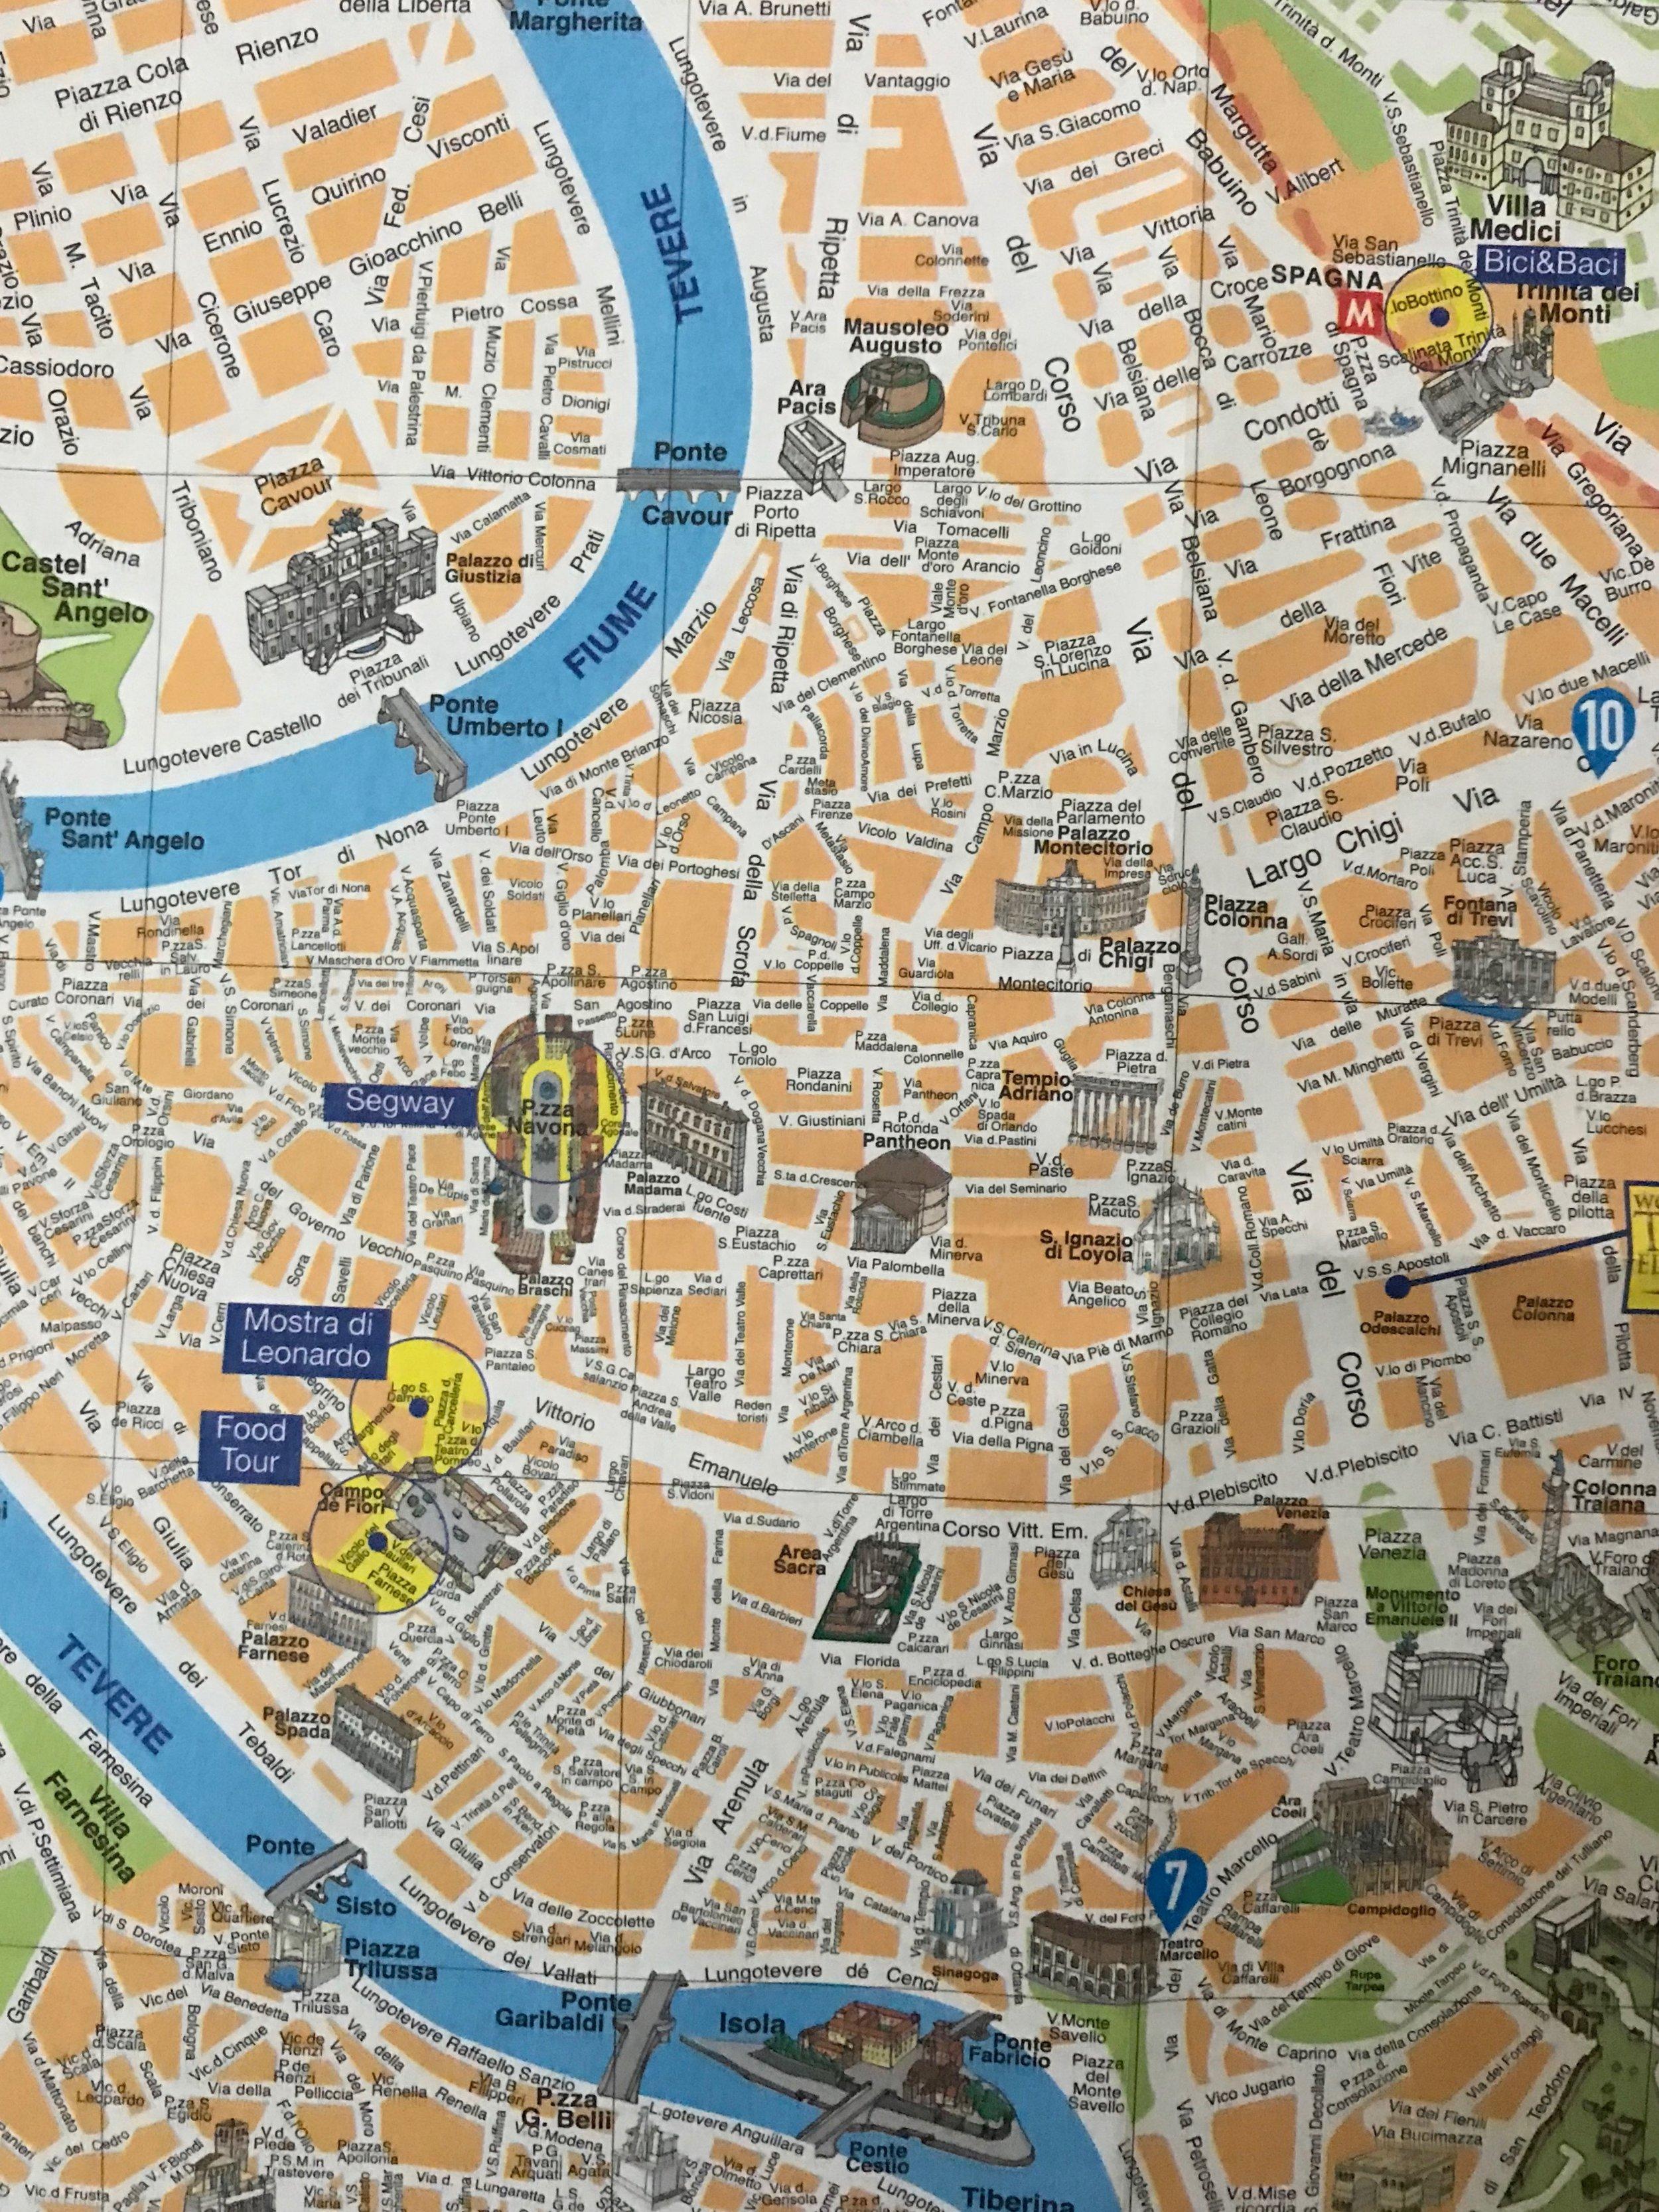 Tourist map of Rome